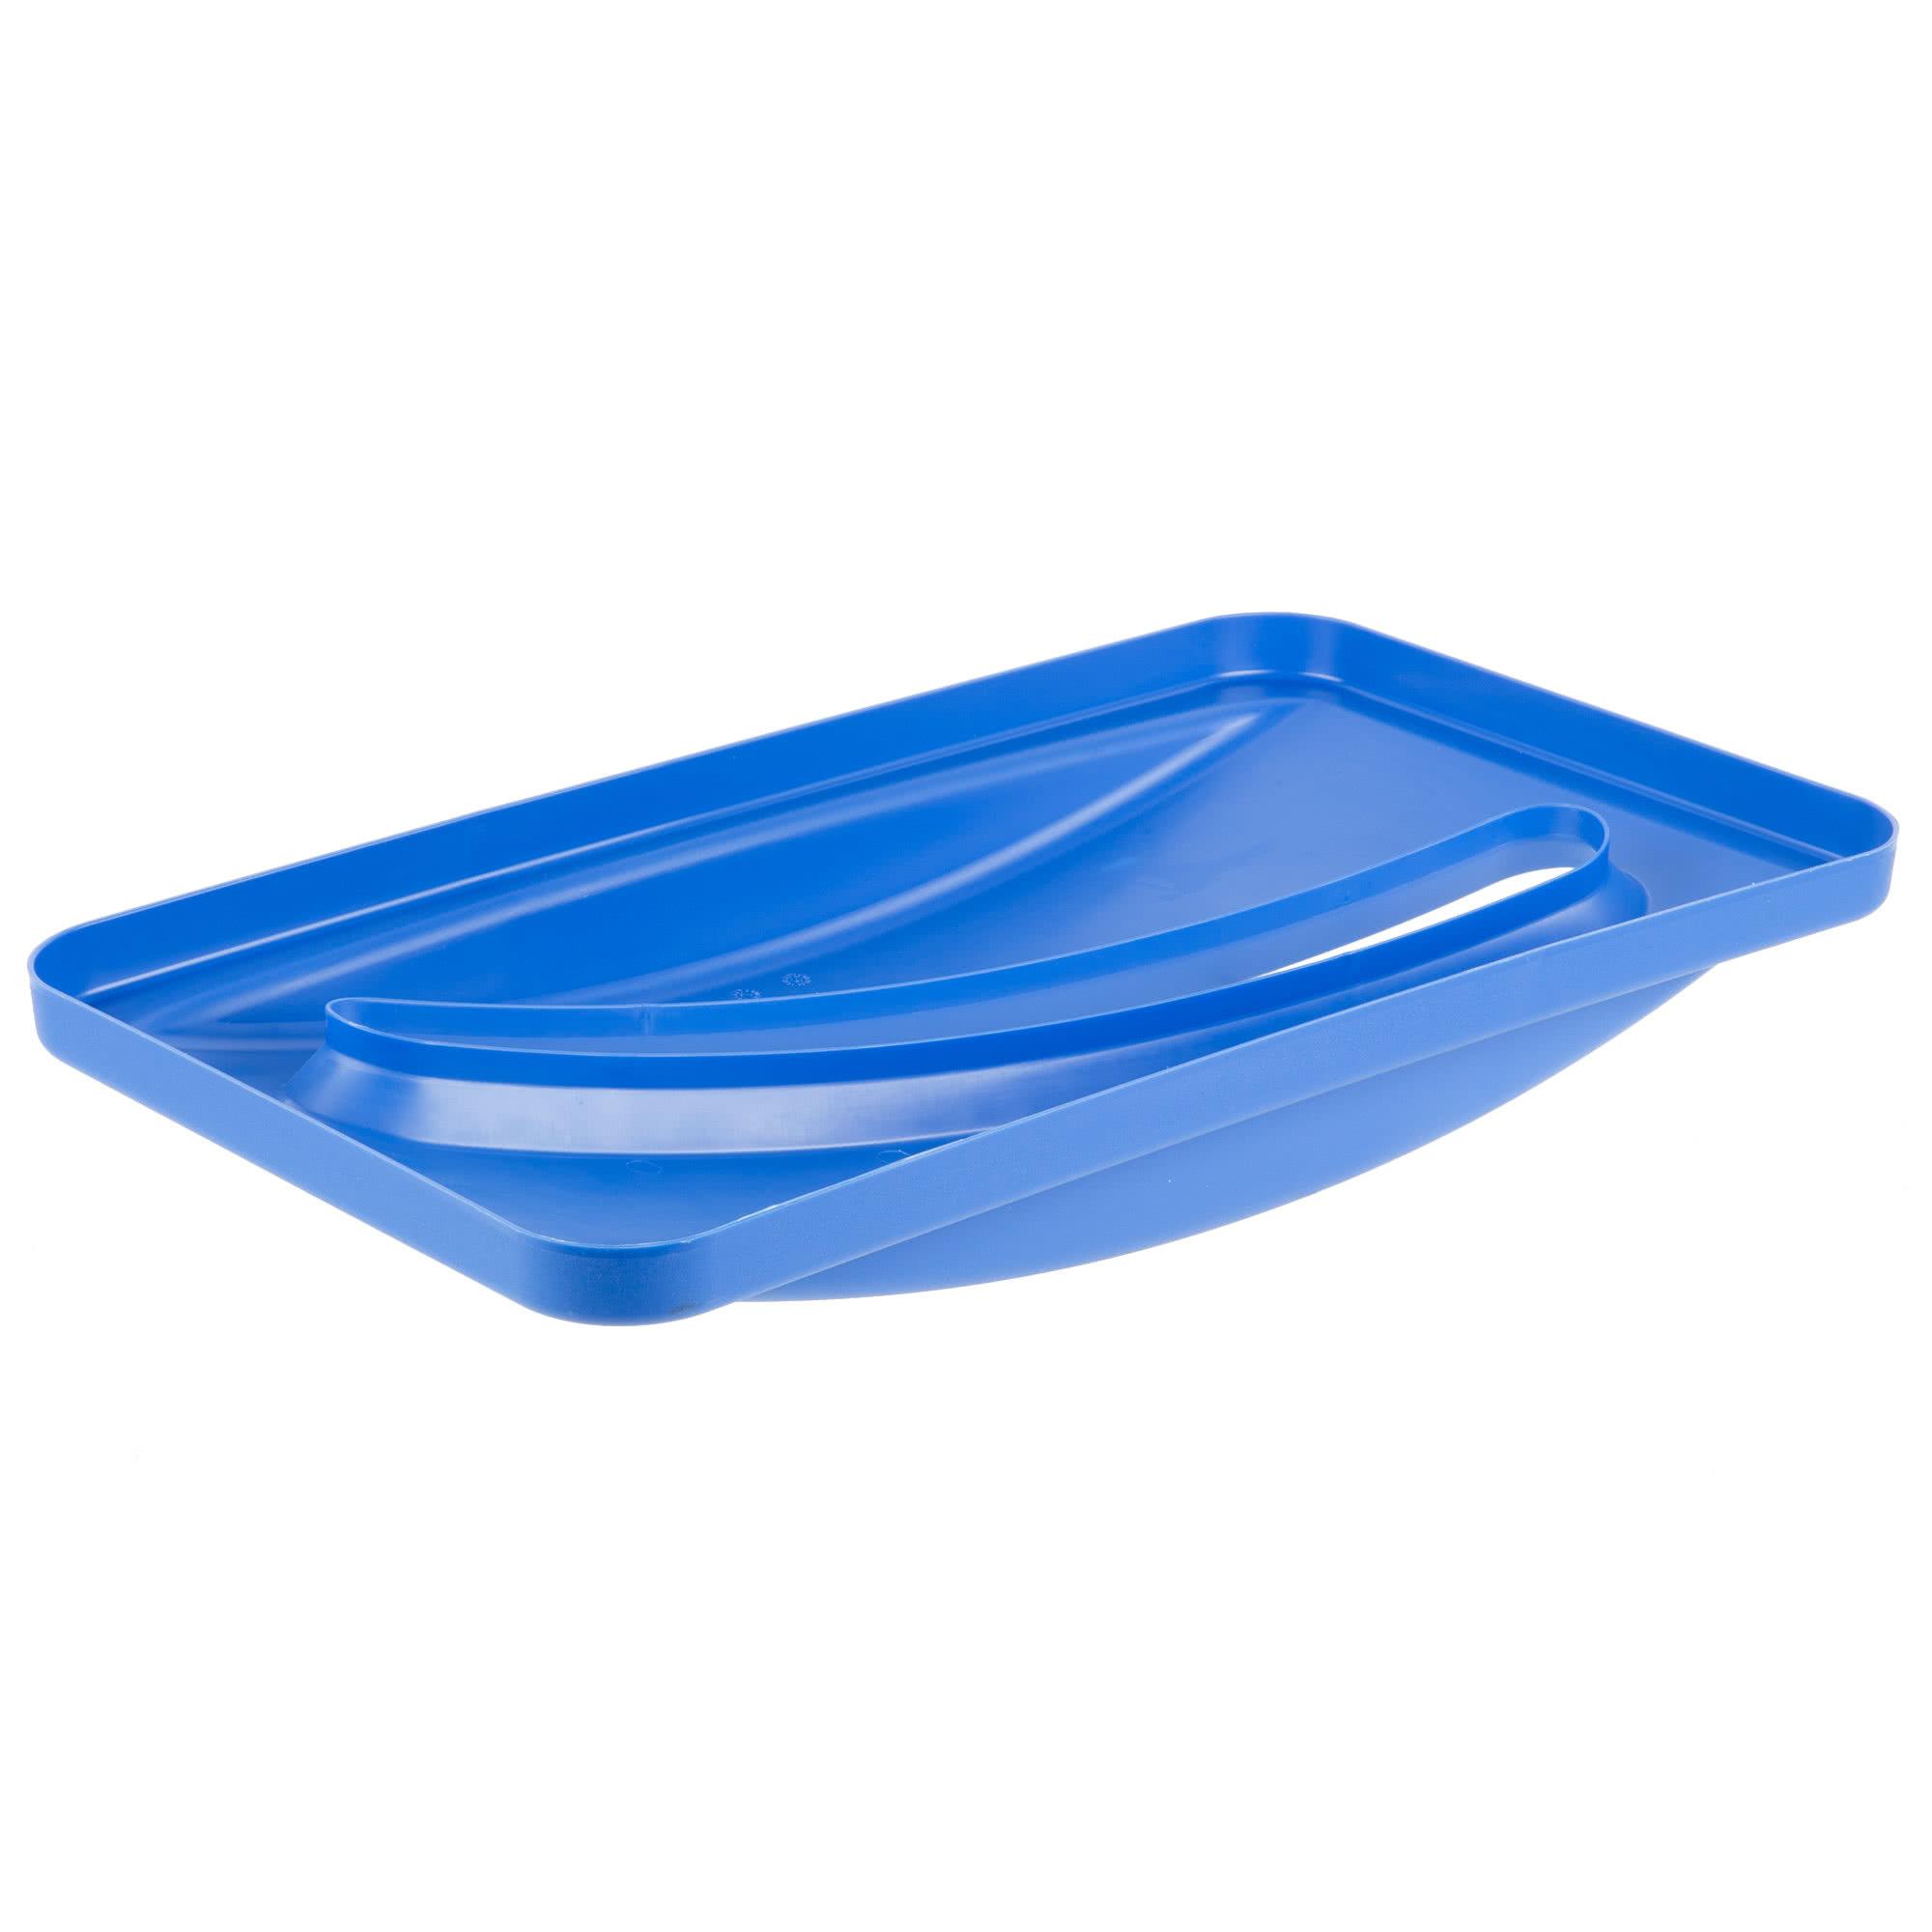 Rubbermaid FG270388BLUE tapa Slim-jim color azul para reciclaje de papel, aplican contenedores Slim-jim 3